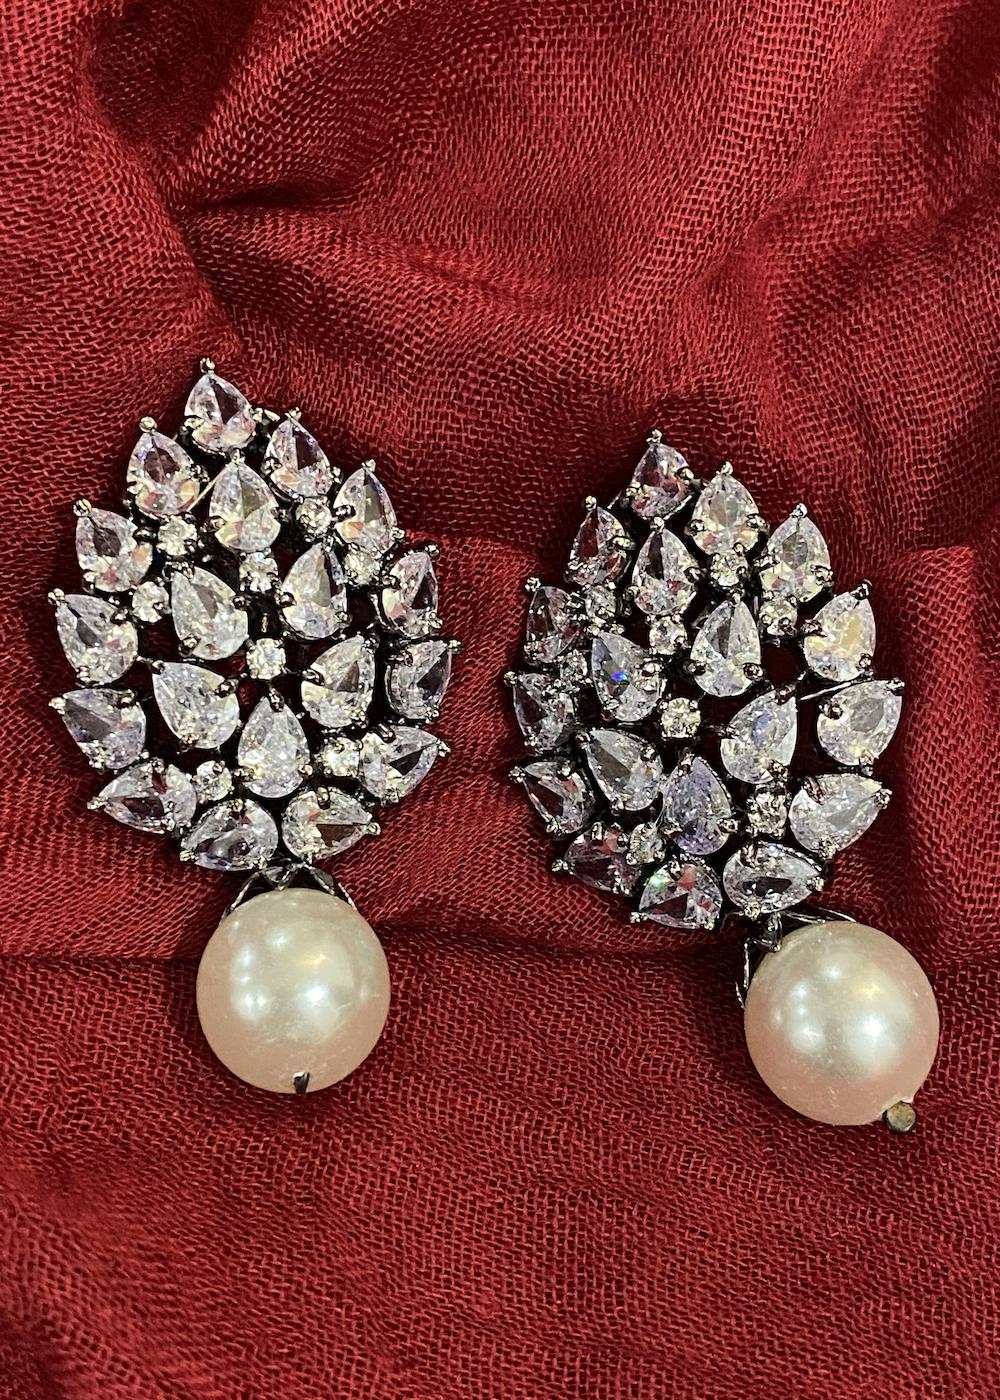 Swabhimann Jewellery | Swabhimann Jwellery Turtle Shell Studs White with Pearl Drop